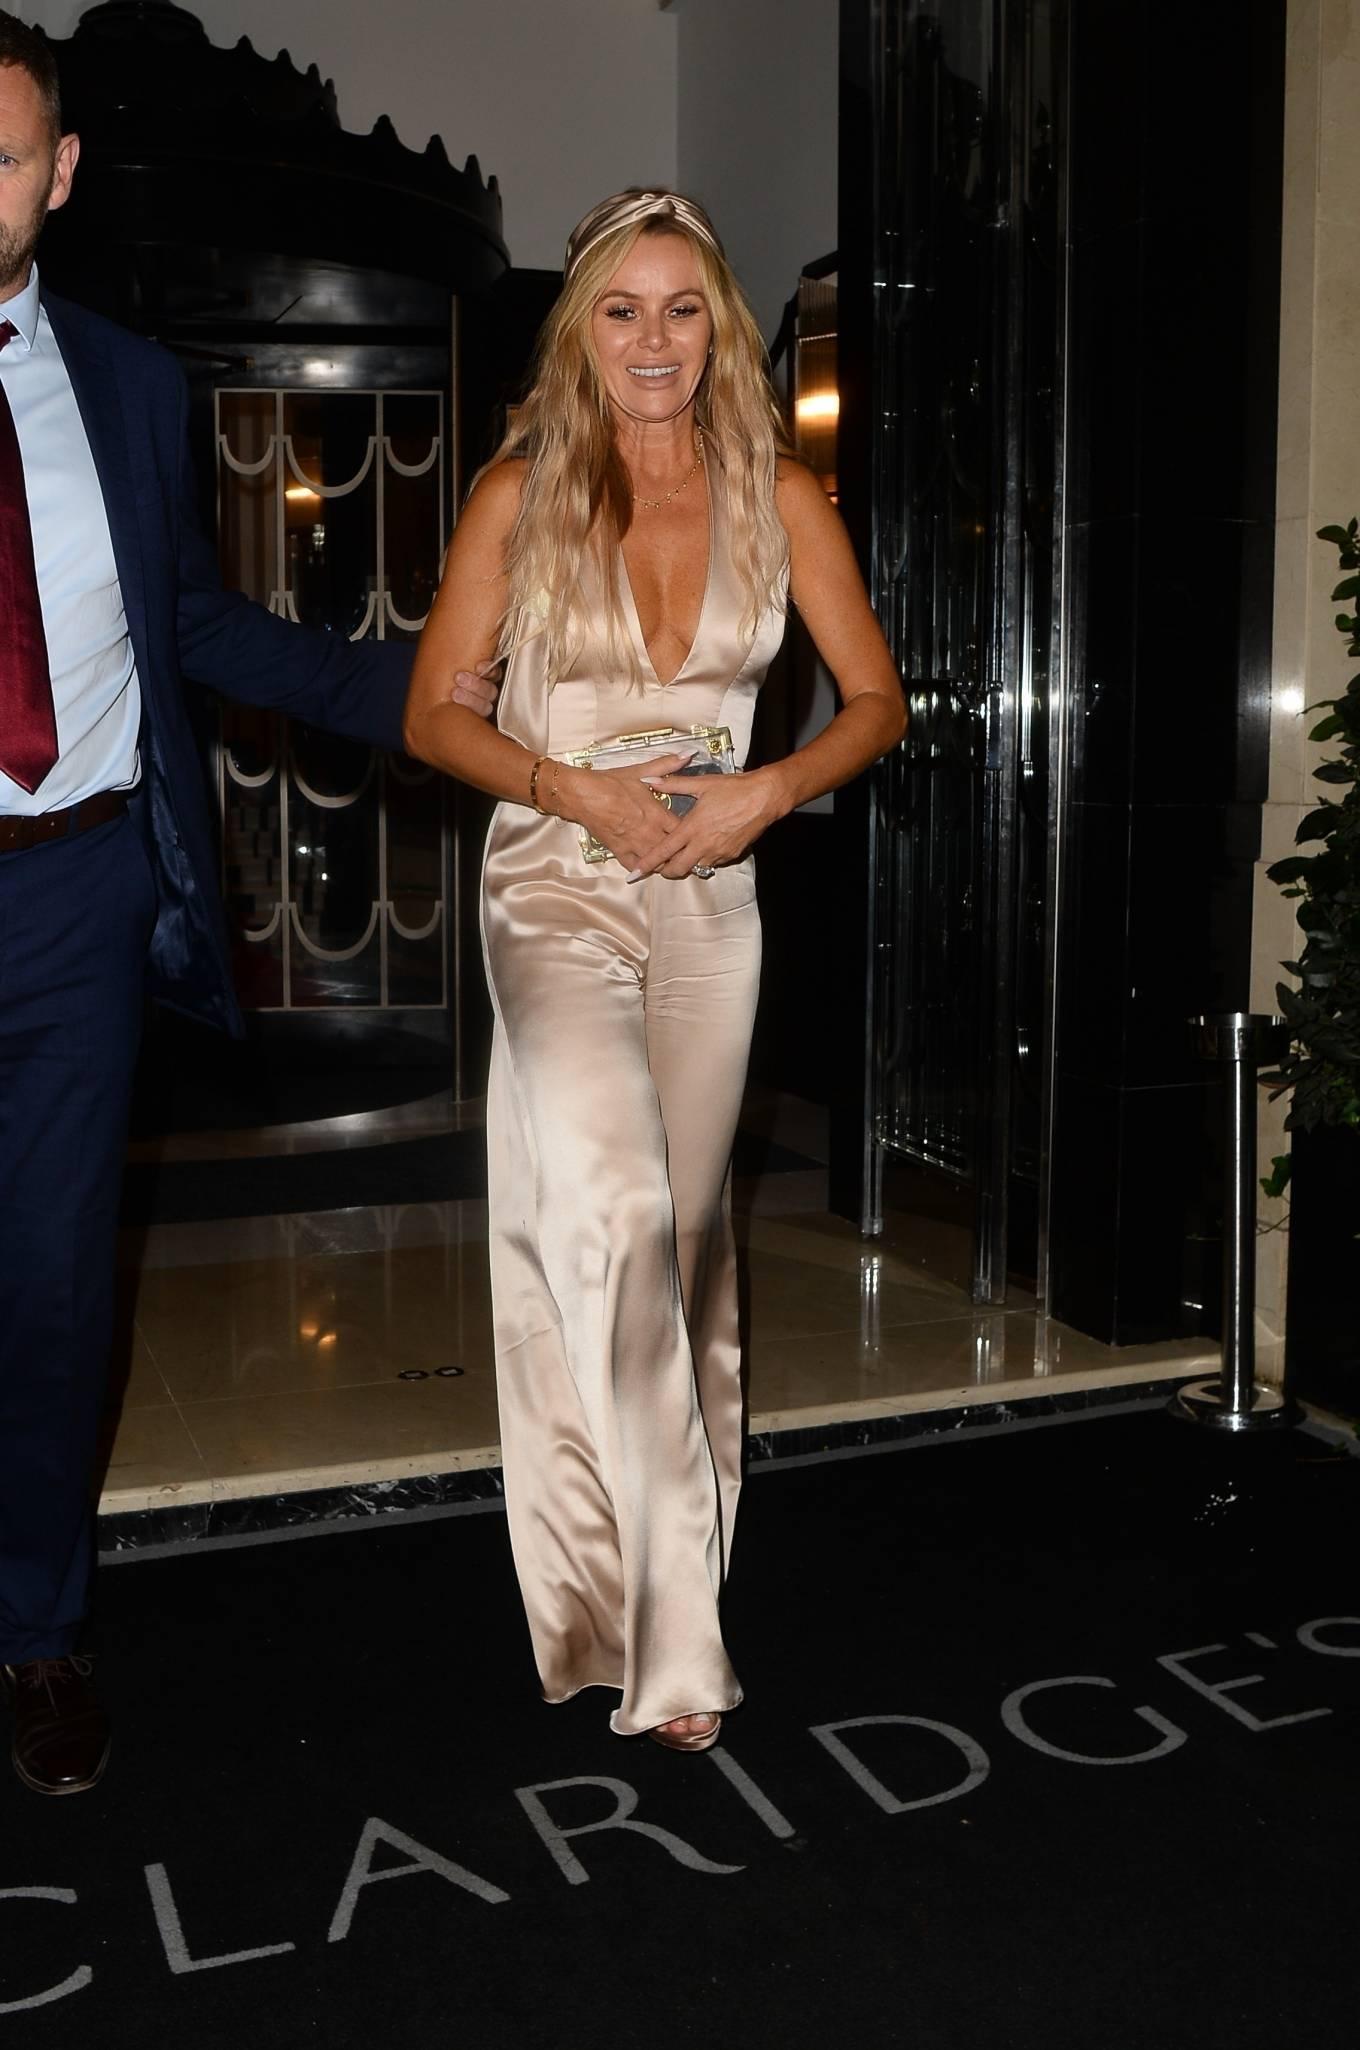 Amanda Holden - attend David Walliams's 50th birthday party at Claridge in London